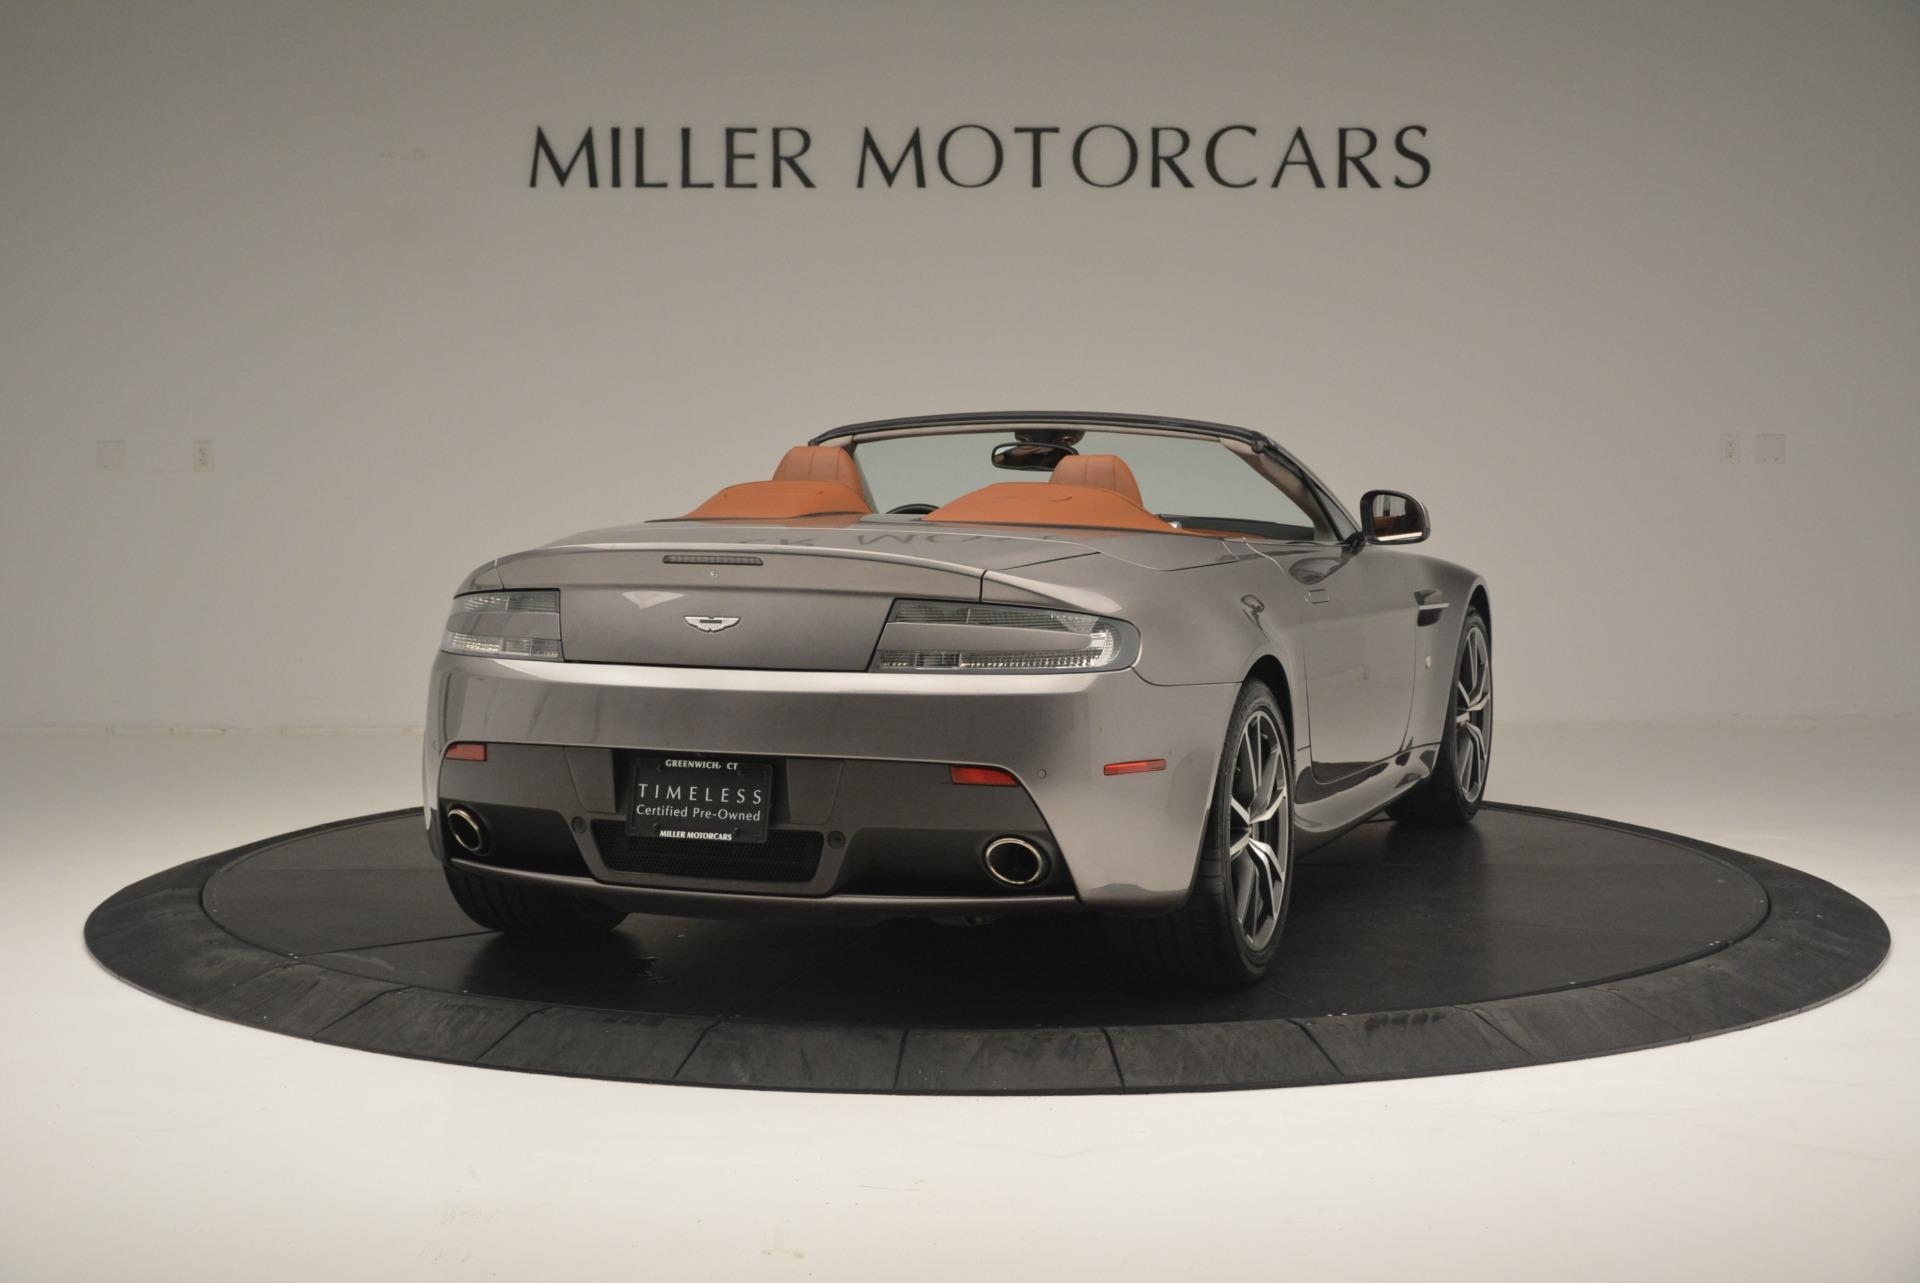 Used 2015 Aston Martin V8 Vantage Roadster For Sale In Greenwich, CT. Alfa Romeo of Greenwich, 7396 2463_p7